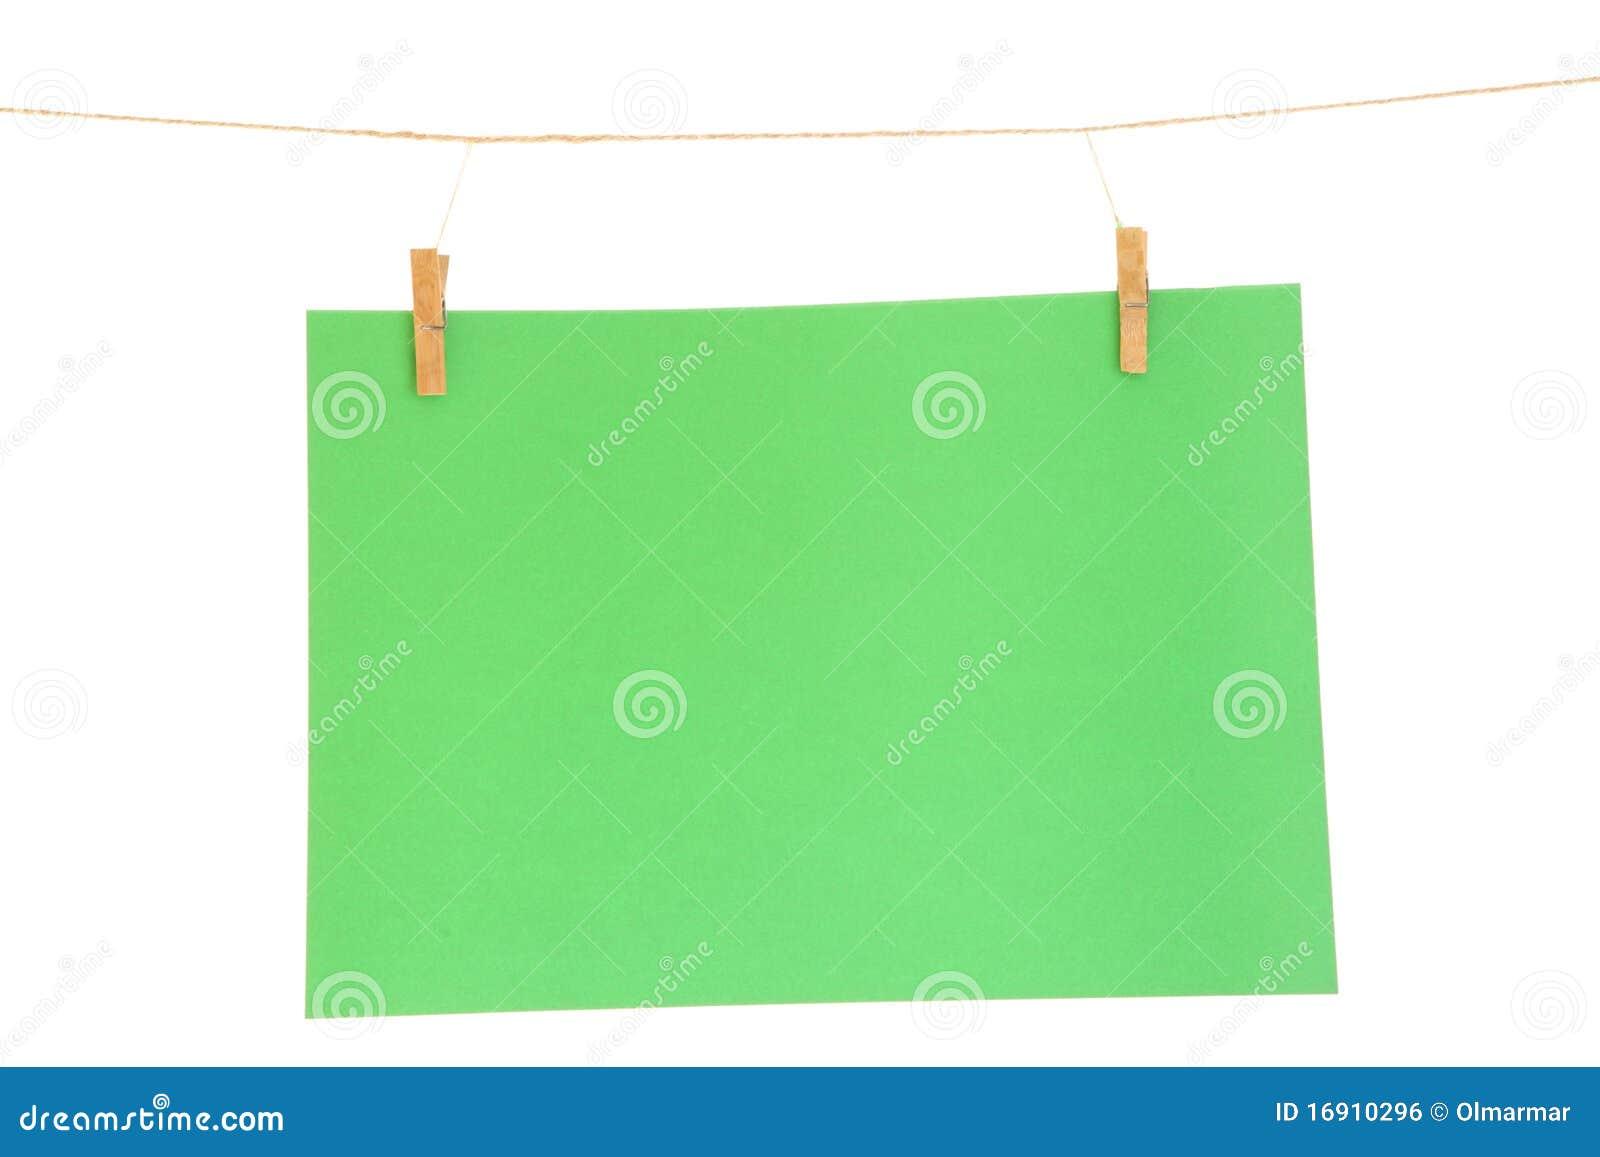 http://thumbs.dreamstime.com/z/green-paper-sheet-16910296.jpg